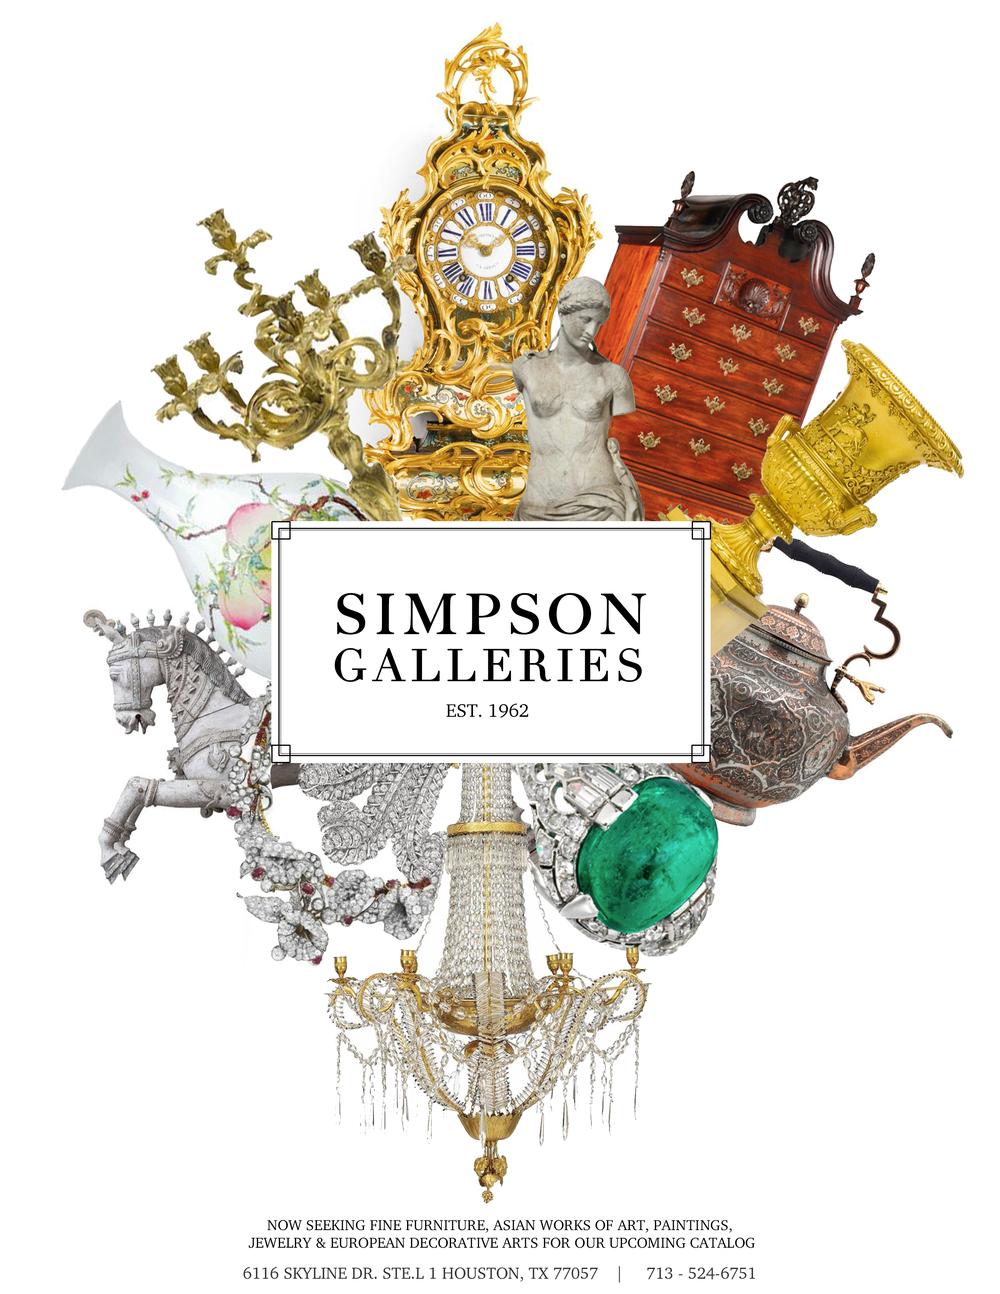 Simpson Galleries Print Advertisement